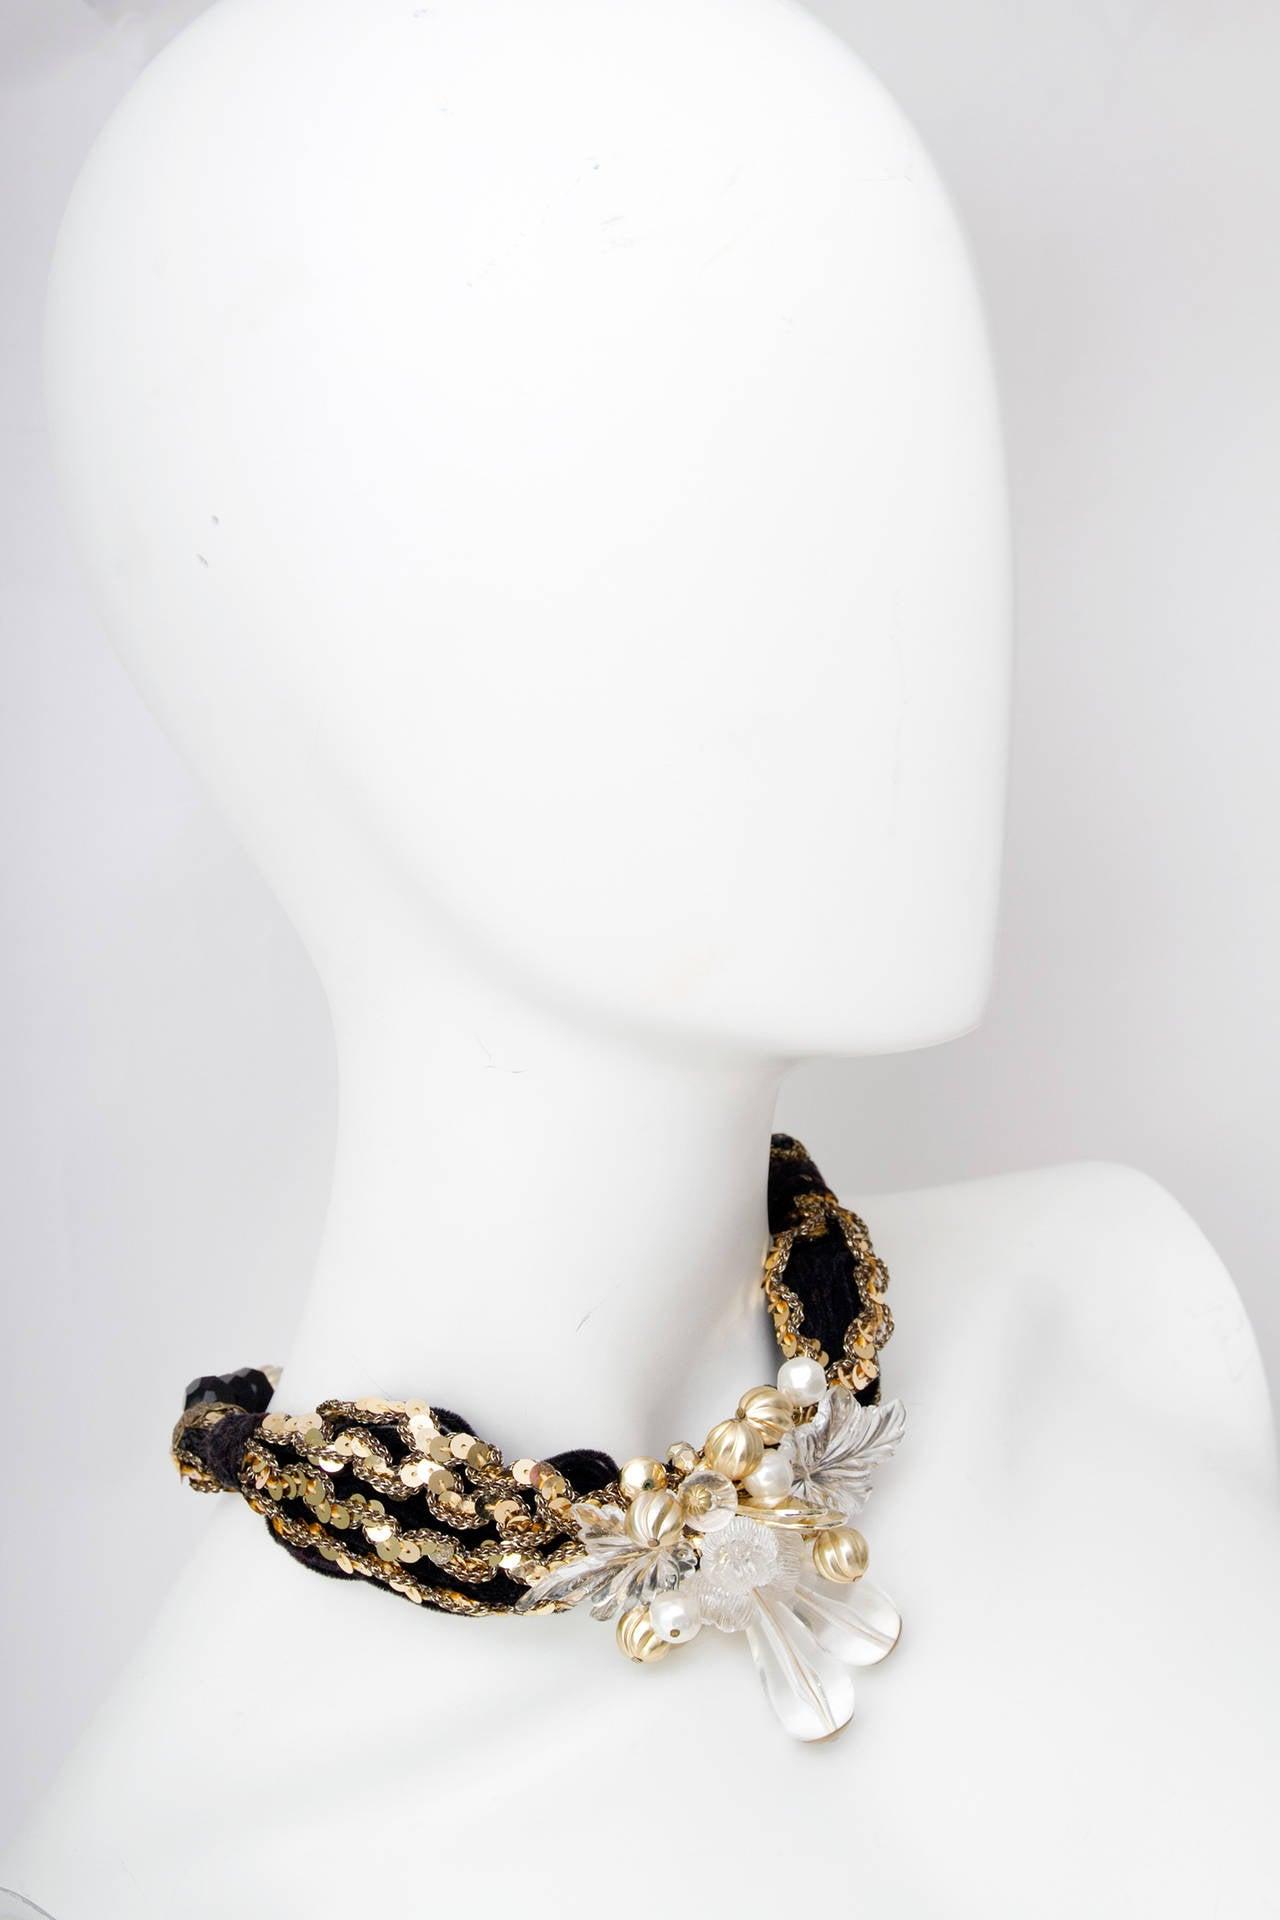 70s Pierre Cardin Black Beads & Gold Sequin Necklace 2